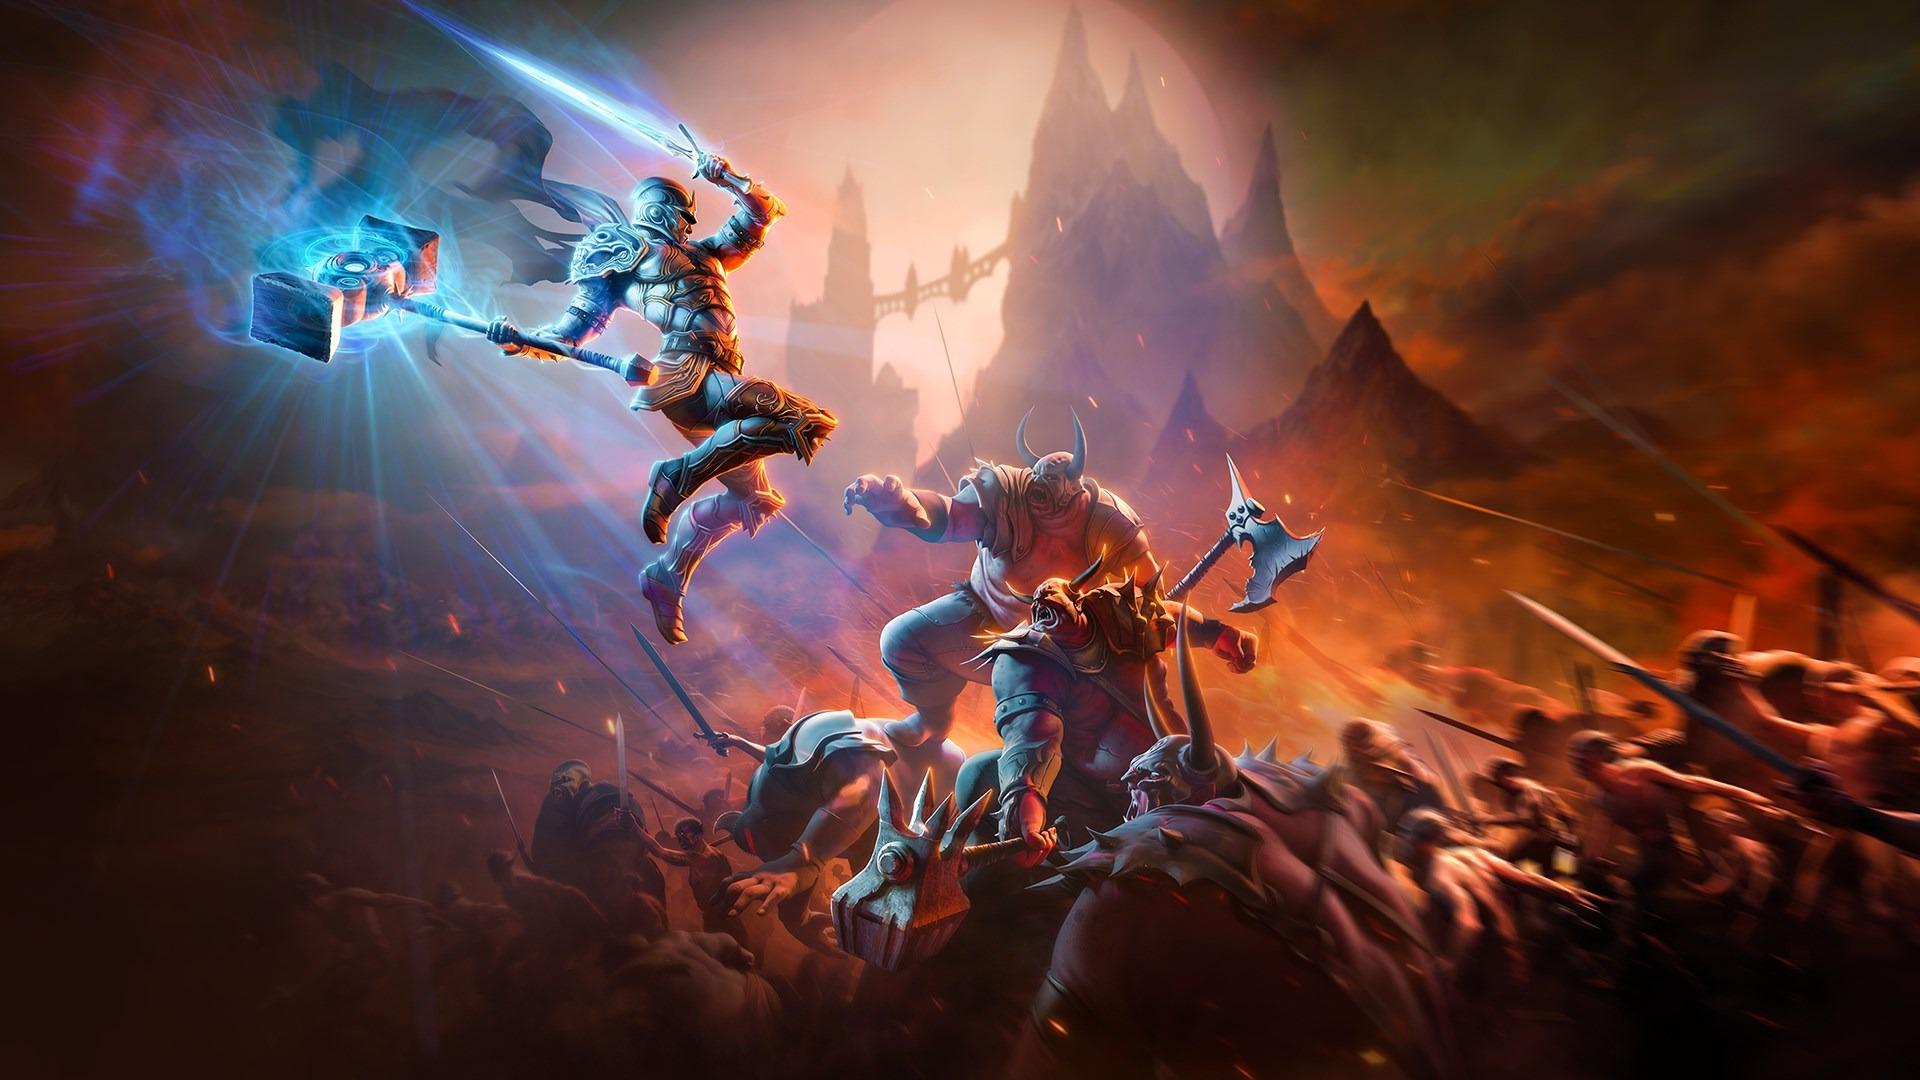 Best Games Like Skyrim - Kingdoms Of Amalur: Reckoning